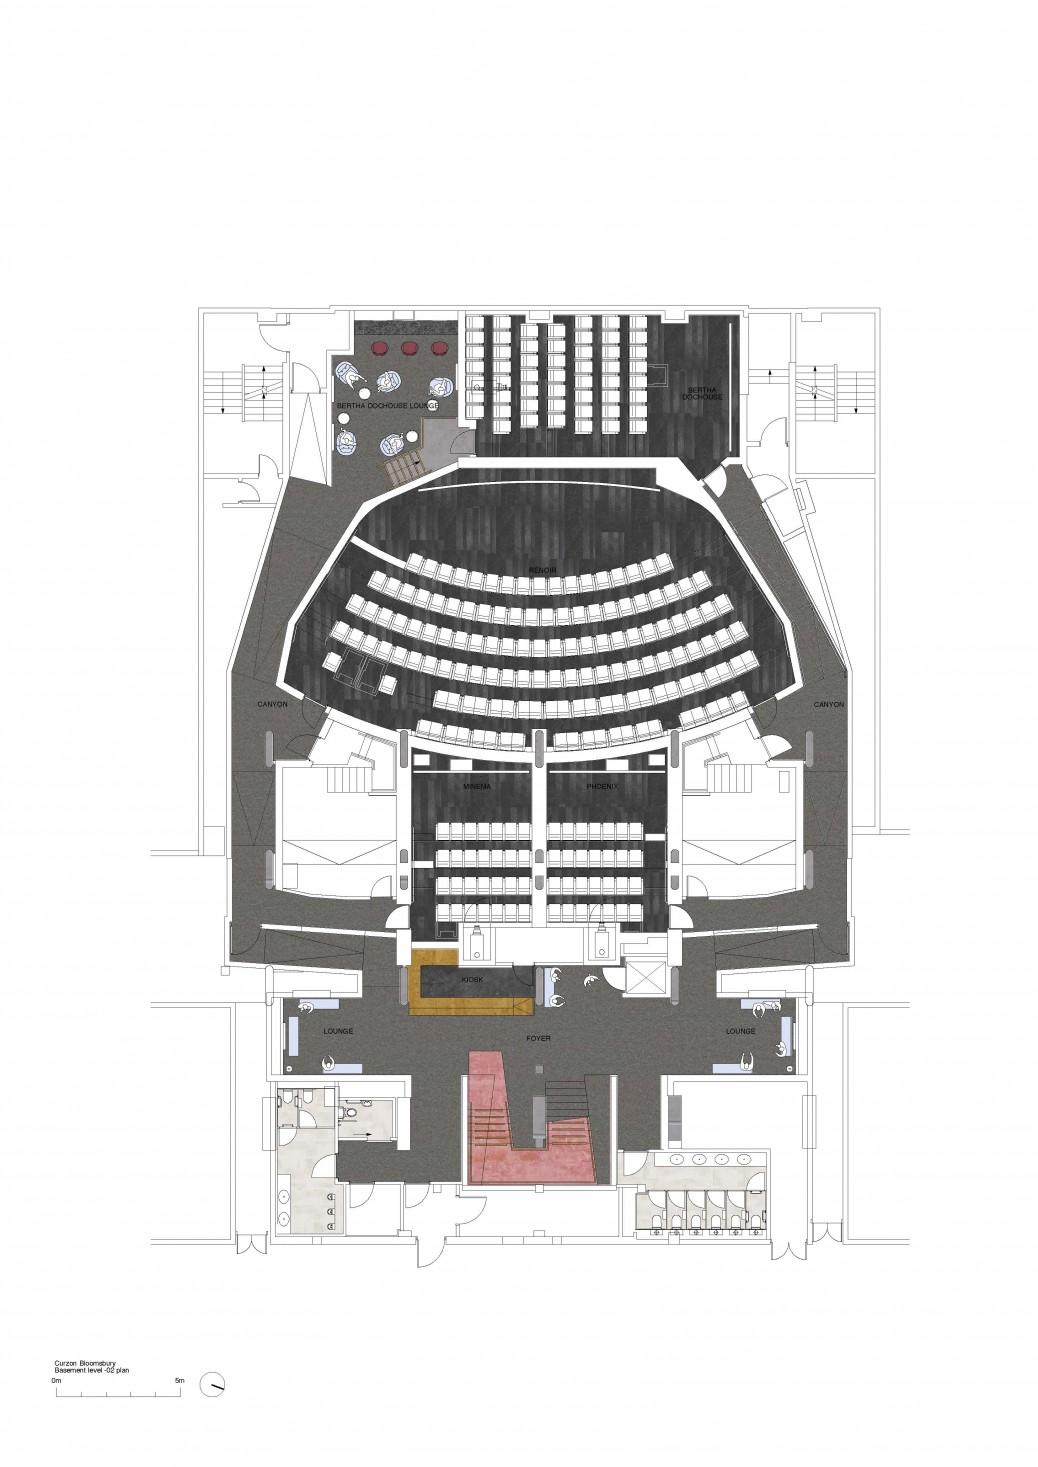 Curzon Bloomsbury_basement level -02 plan